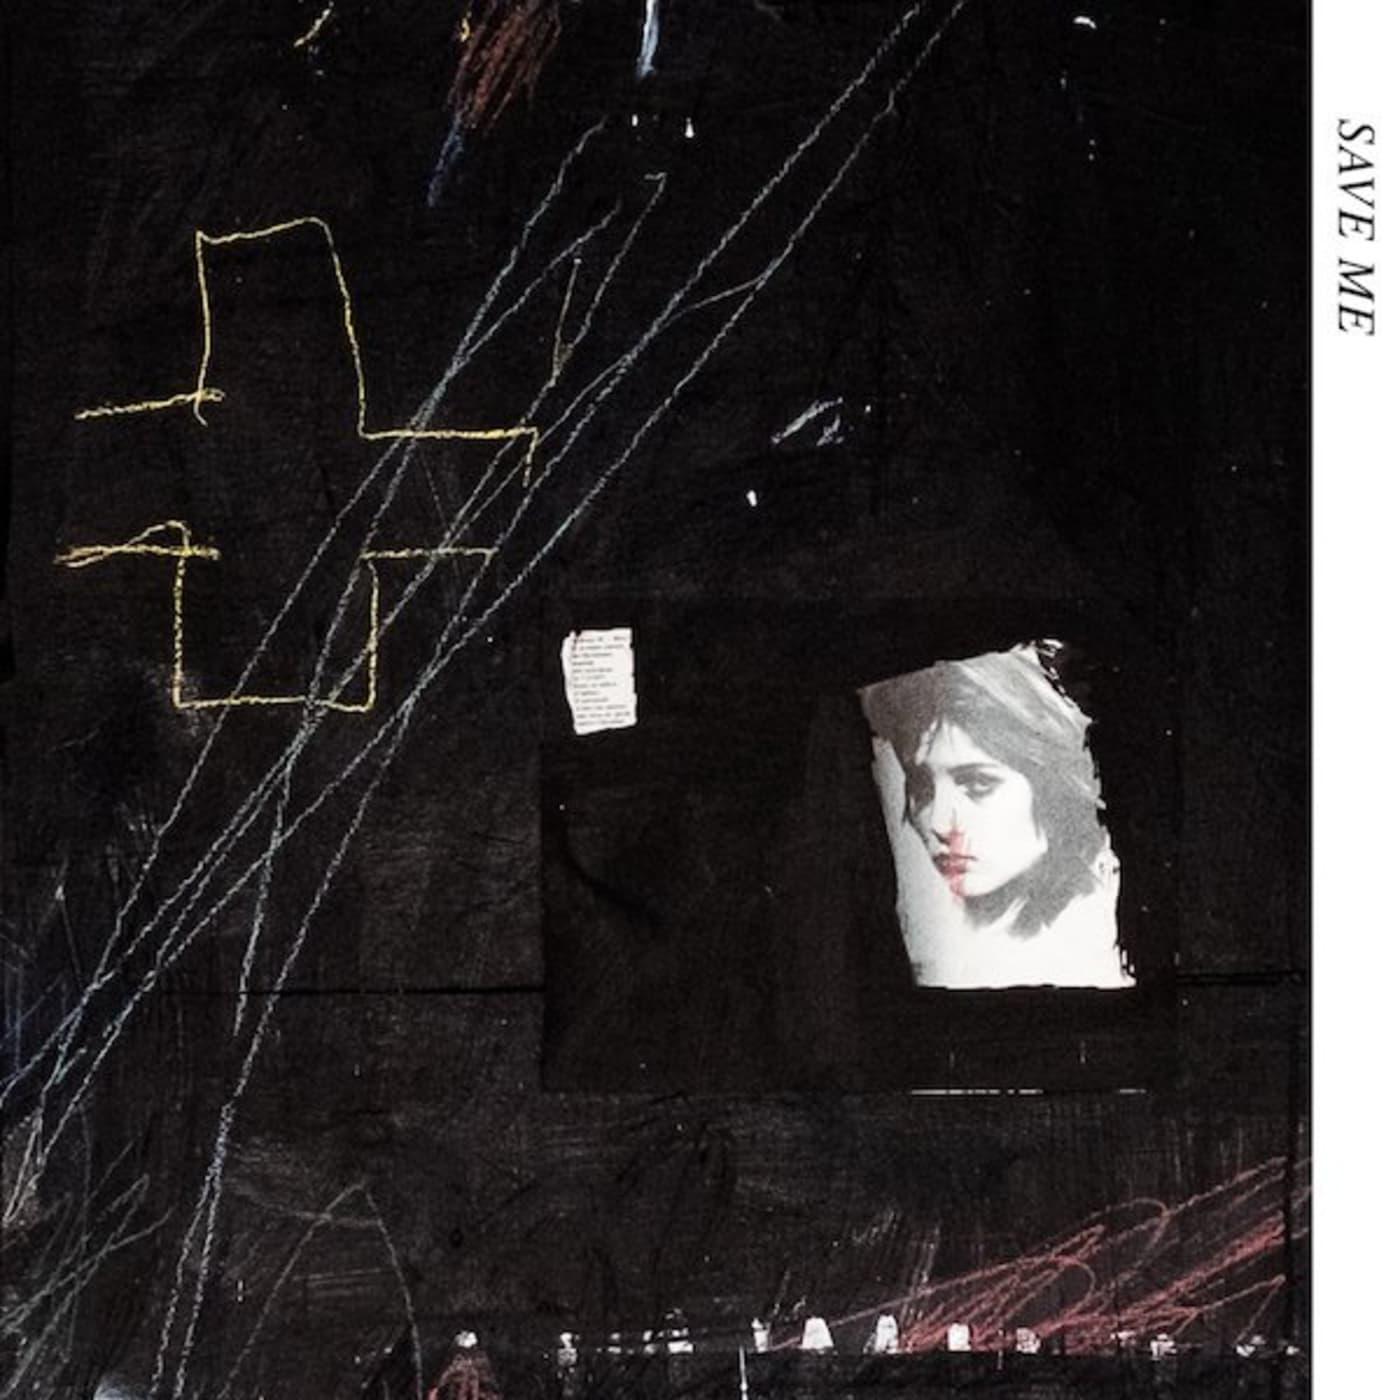 Future 'Save Me' EP